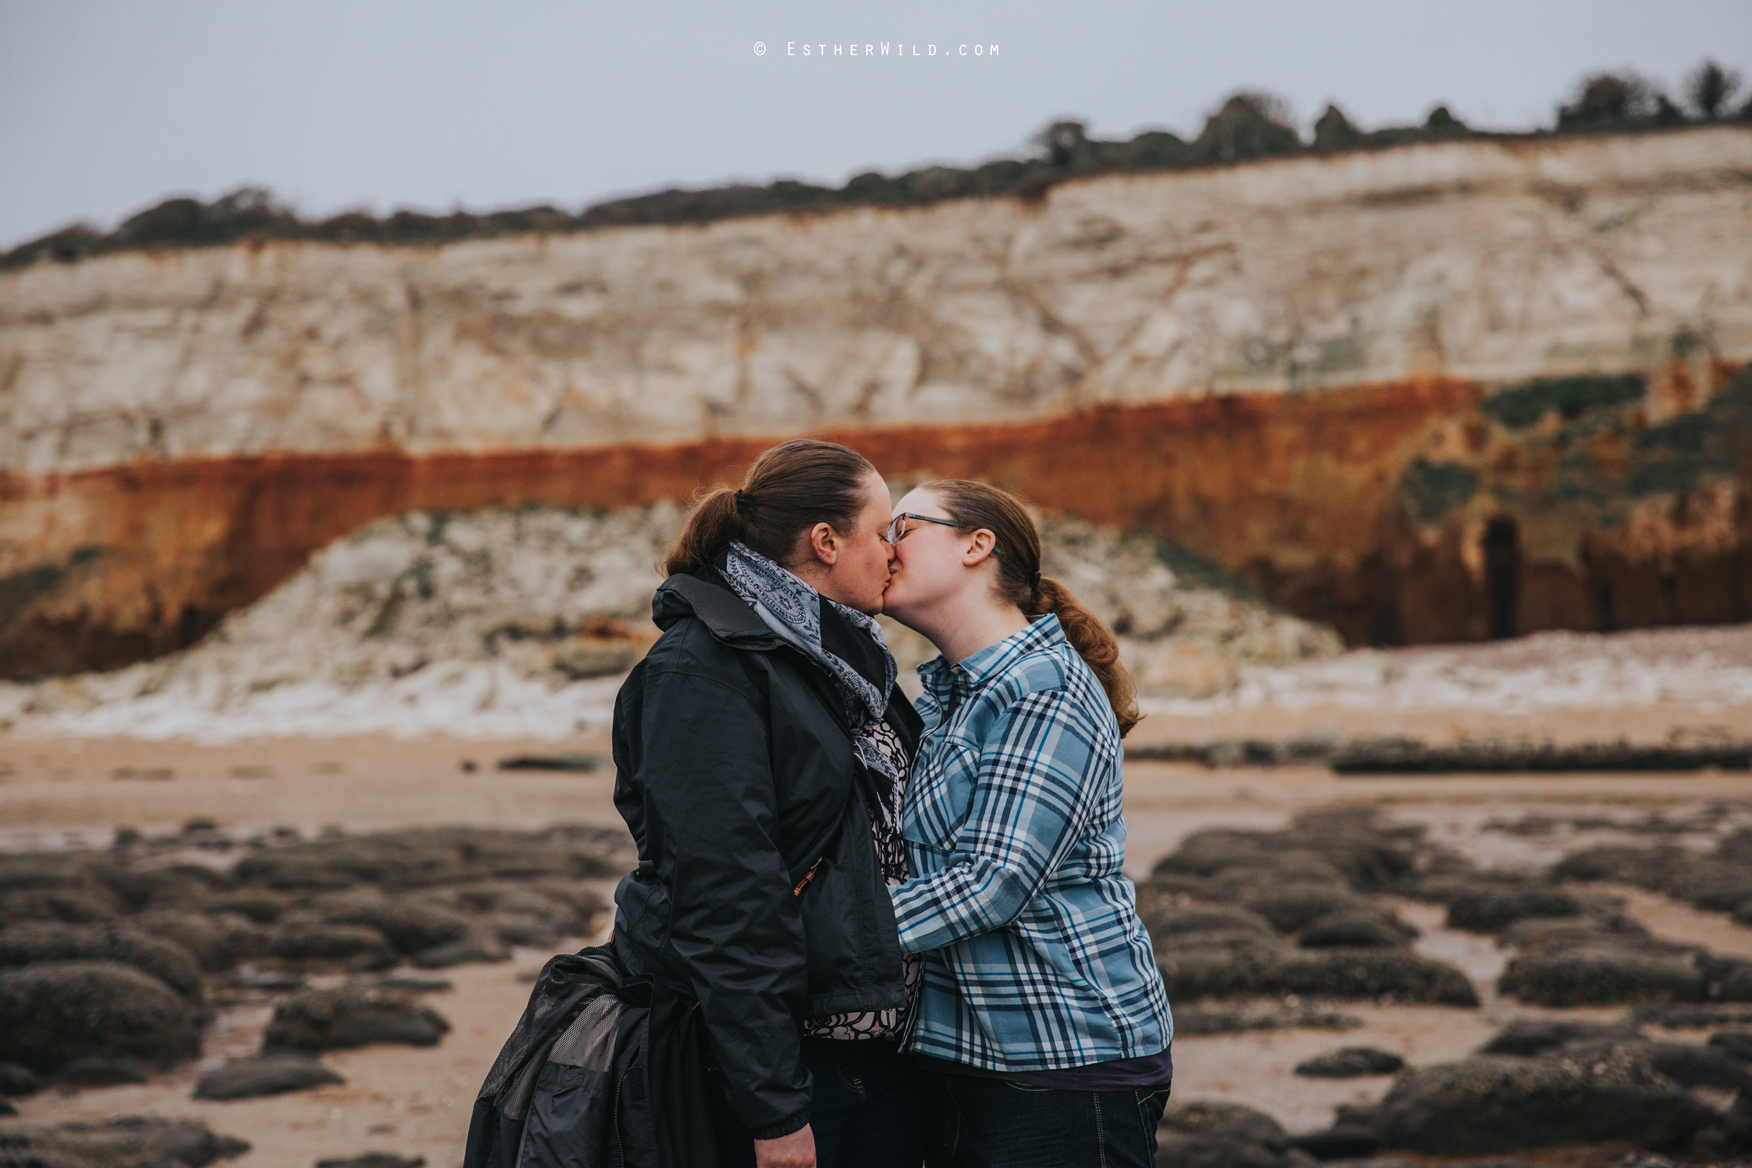 Hunstanton_Photo_Session_Engagement_Love_Pre-Wedding_IMG_5504.jpg